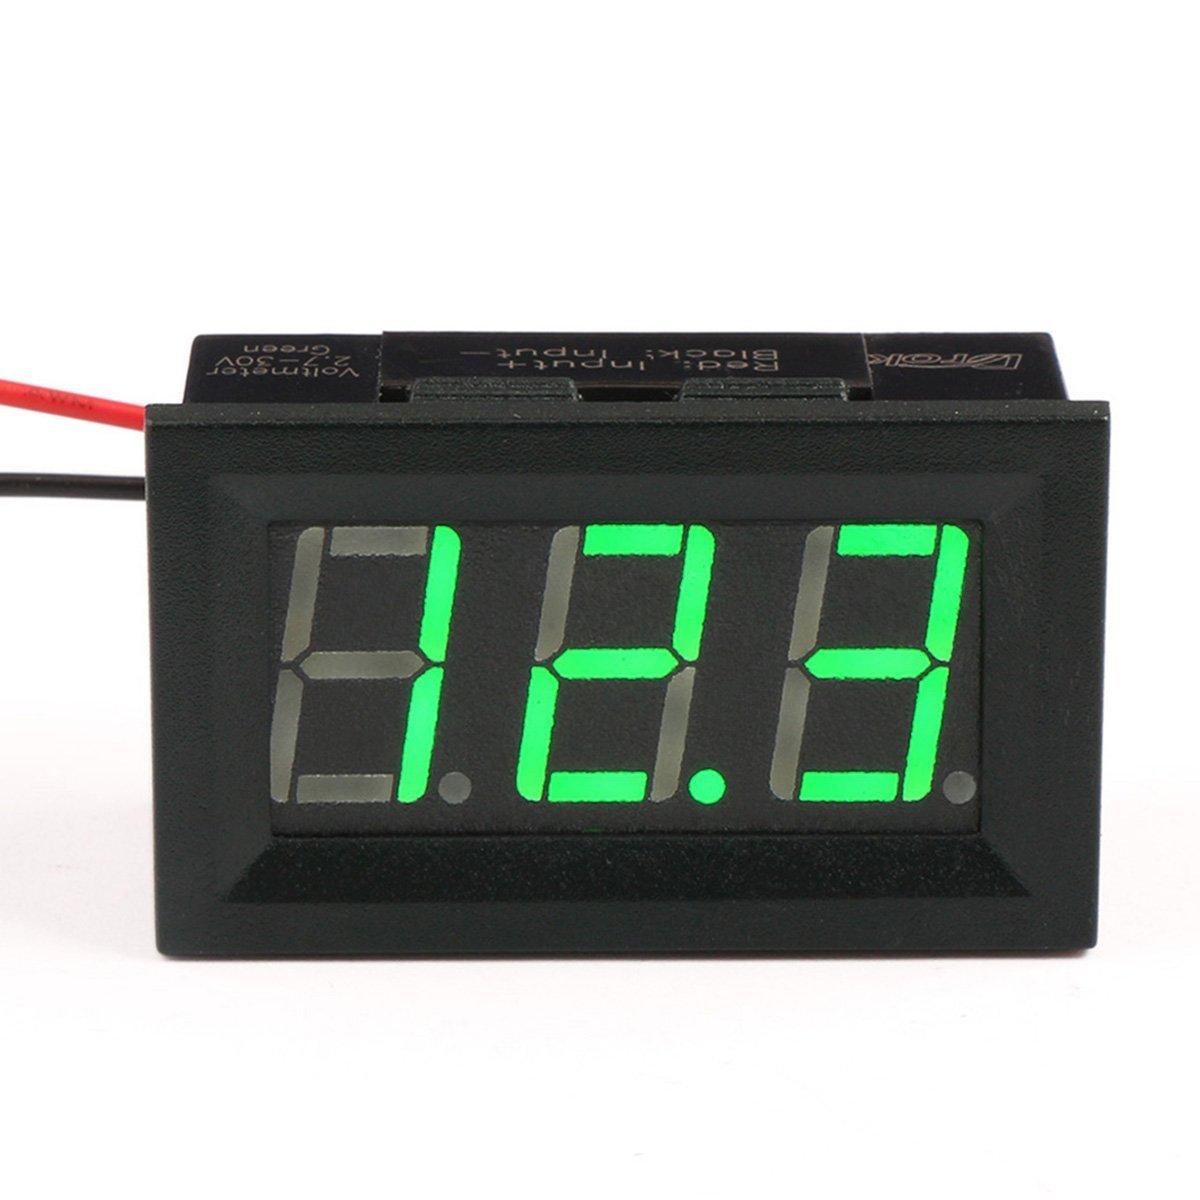 DROK Panel Meter